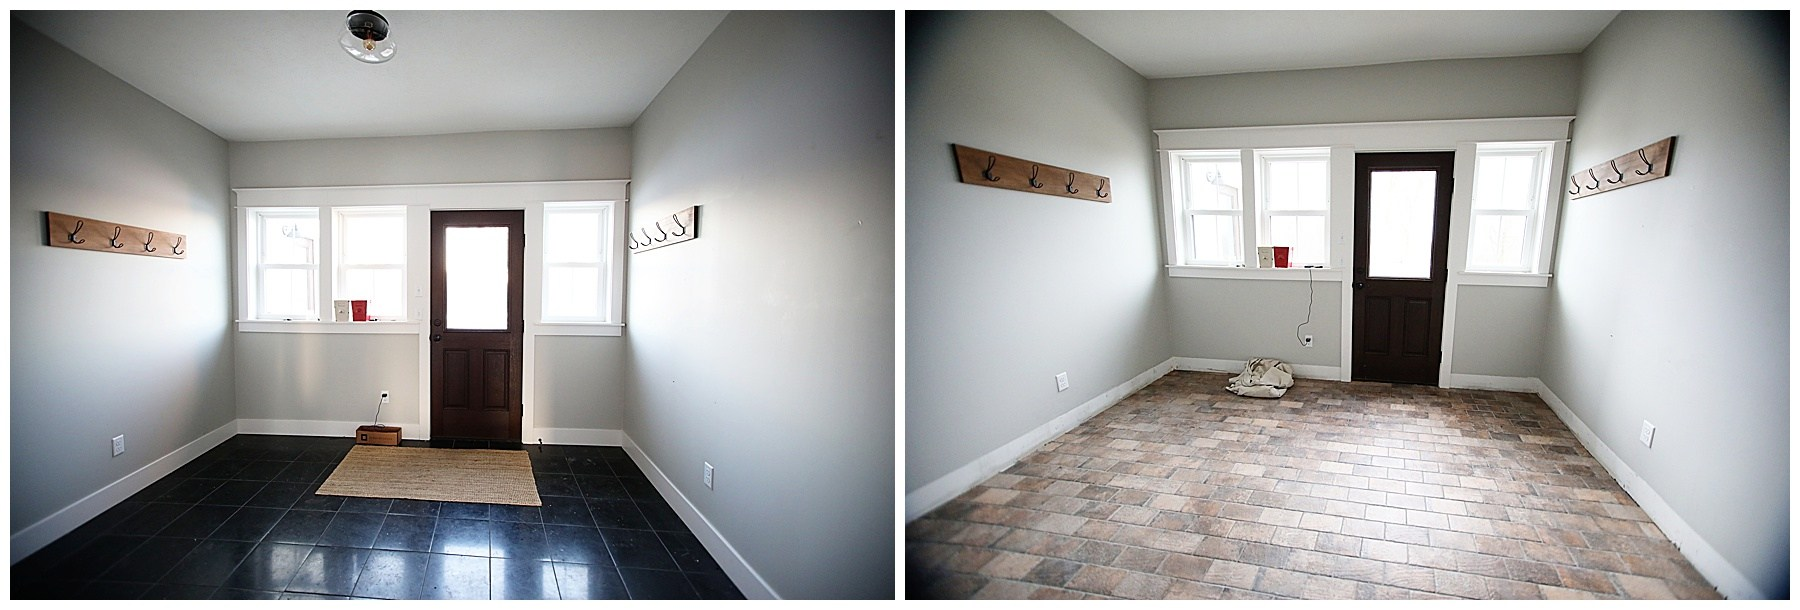 Farmhouse home renovation progress